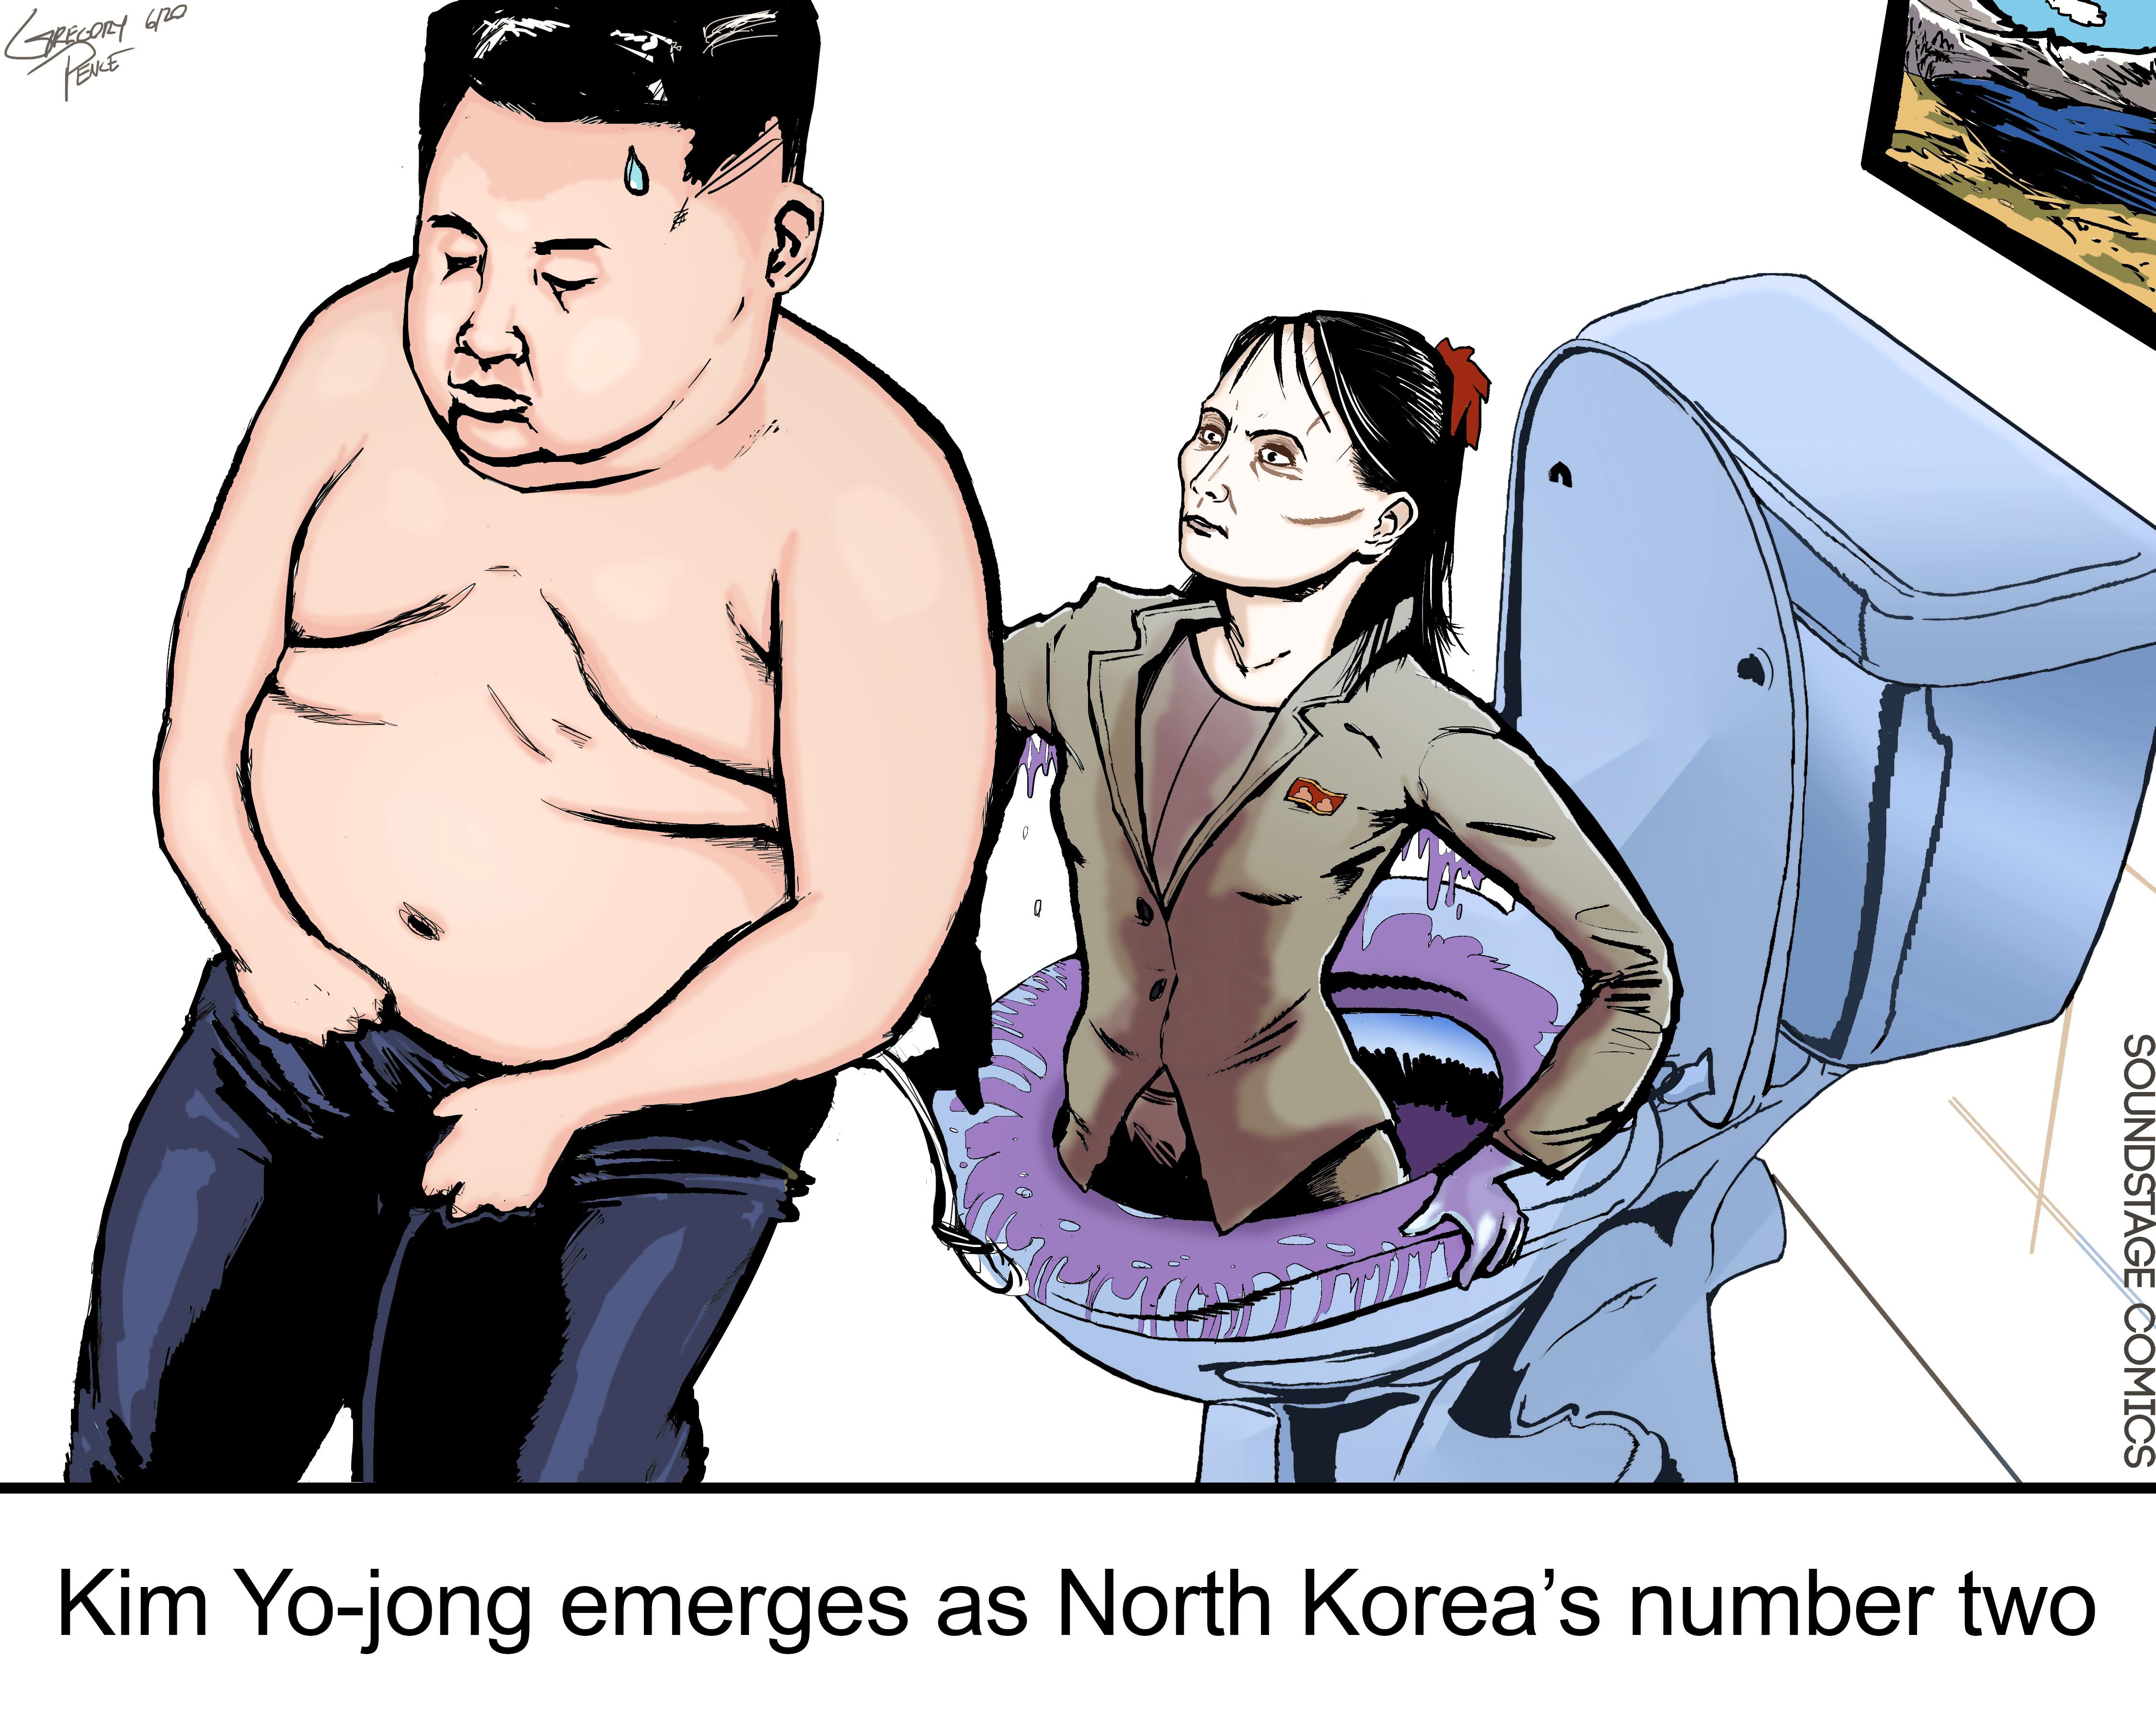 Kim Jong Un, Kim Yo Jong, North Korea